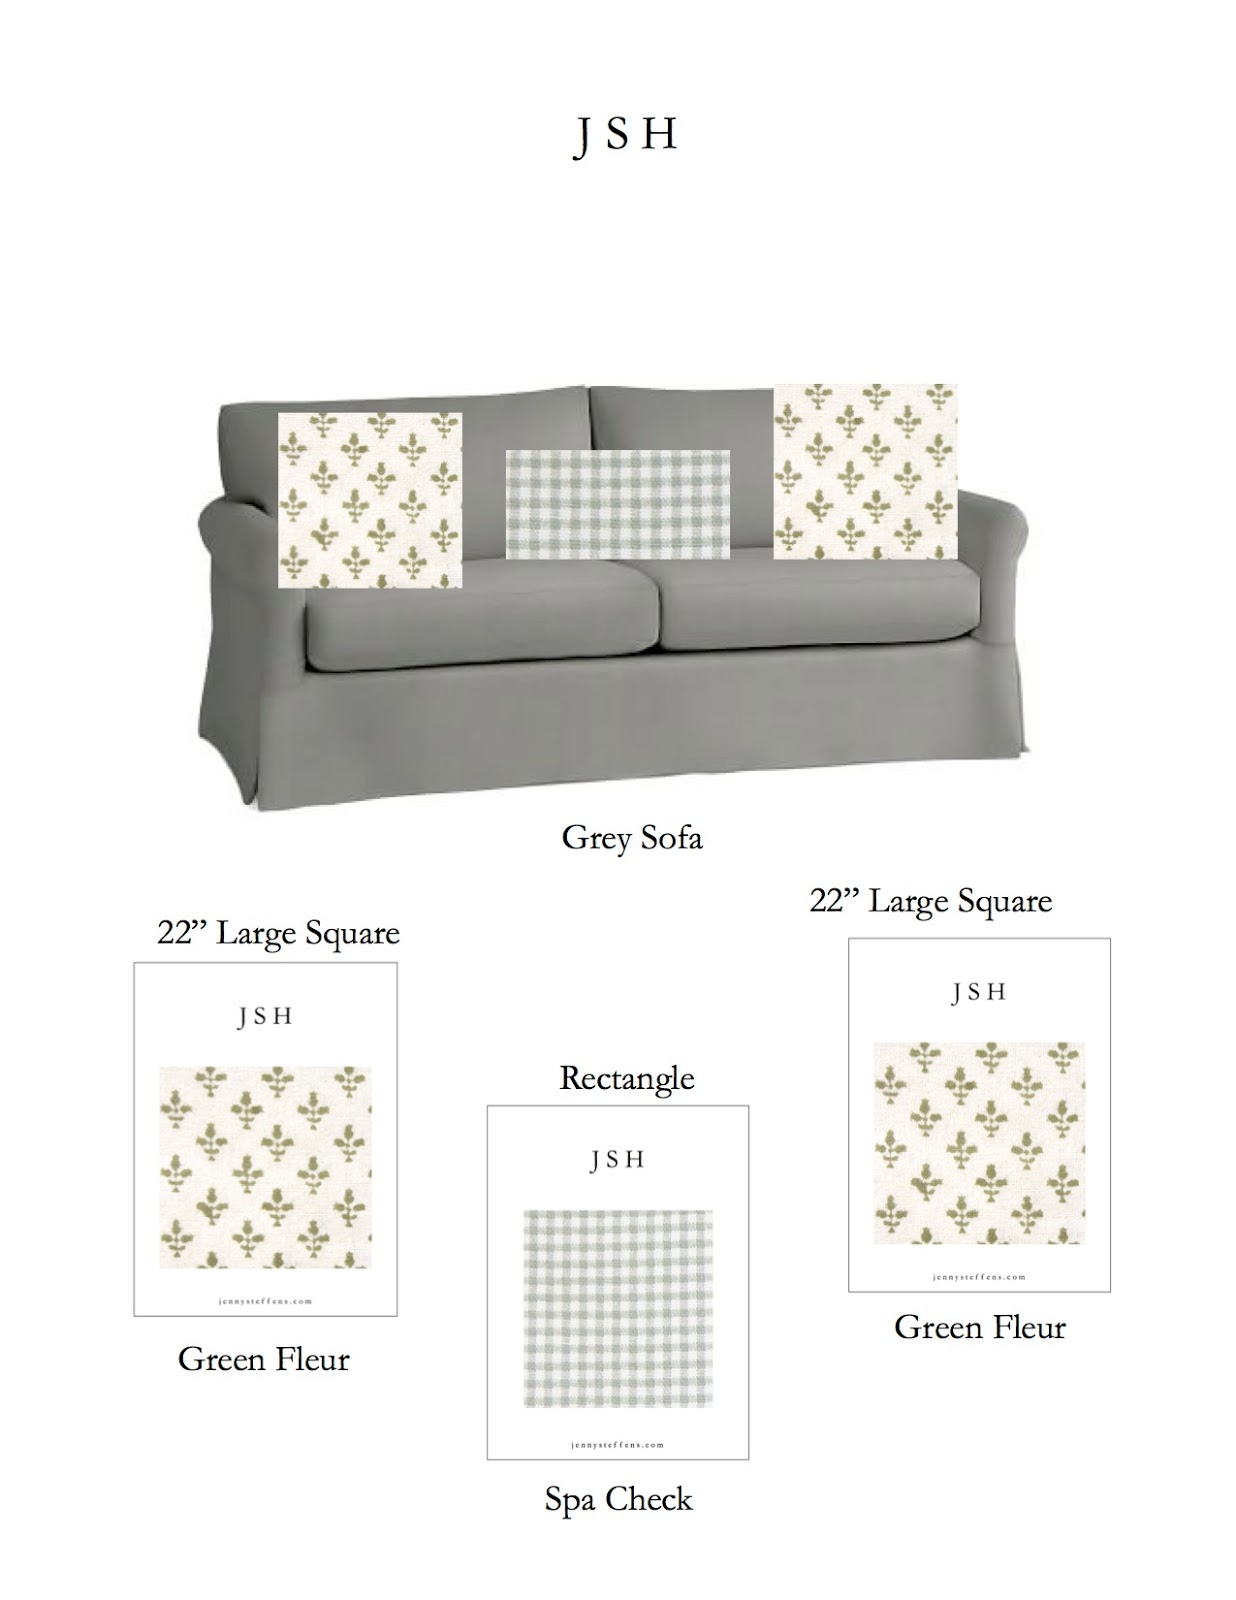 Sofa Rph Large Pillows Brown Jenny Steffens Hobick